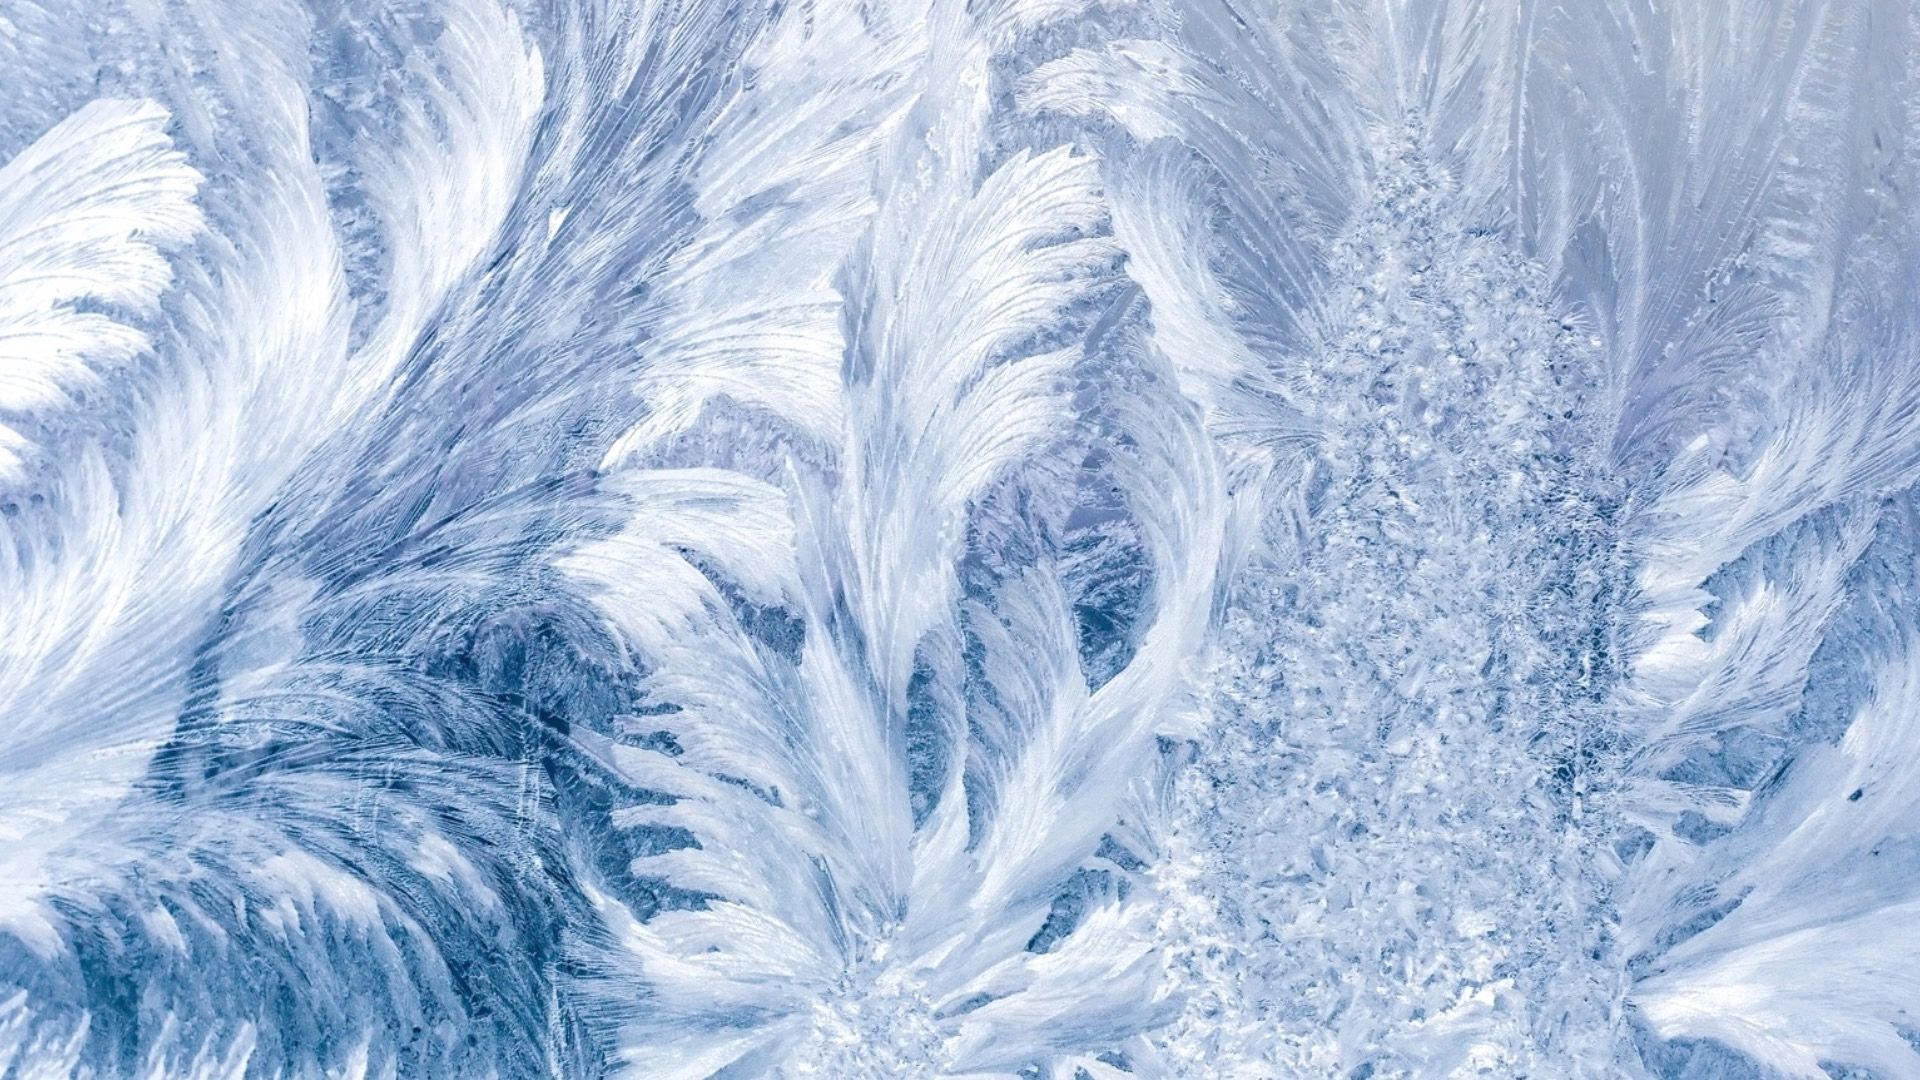 Winter Patterns On The Window pc wallpaper